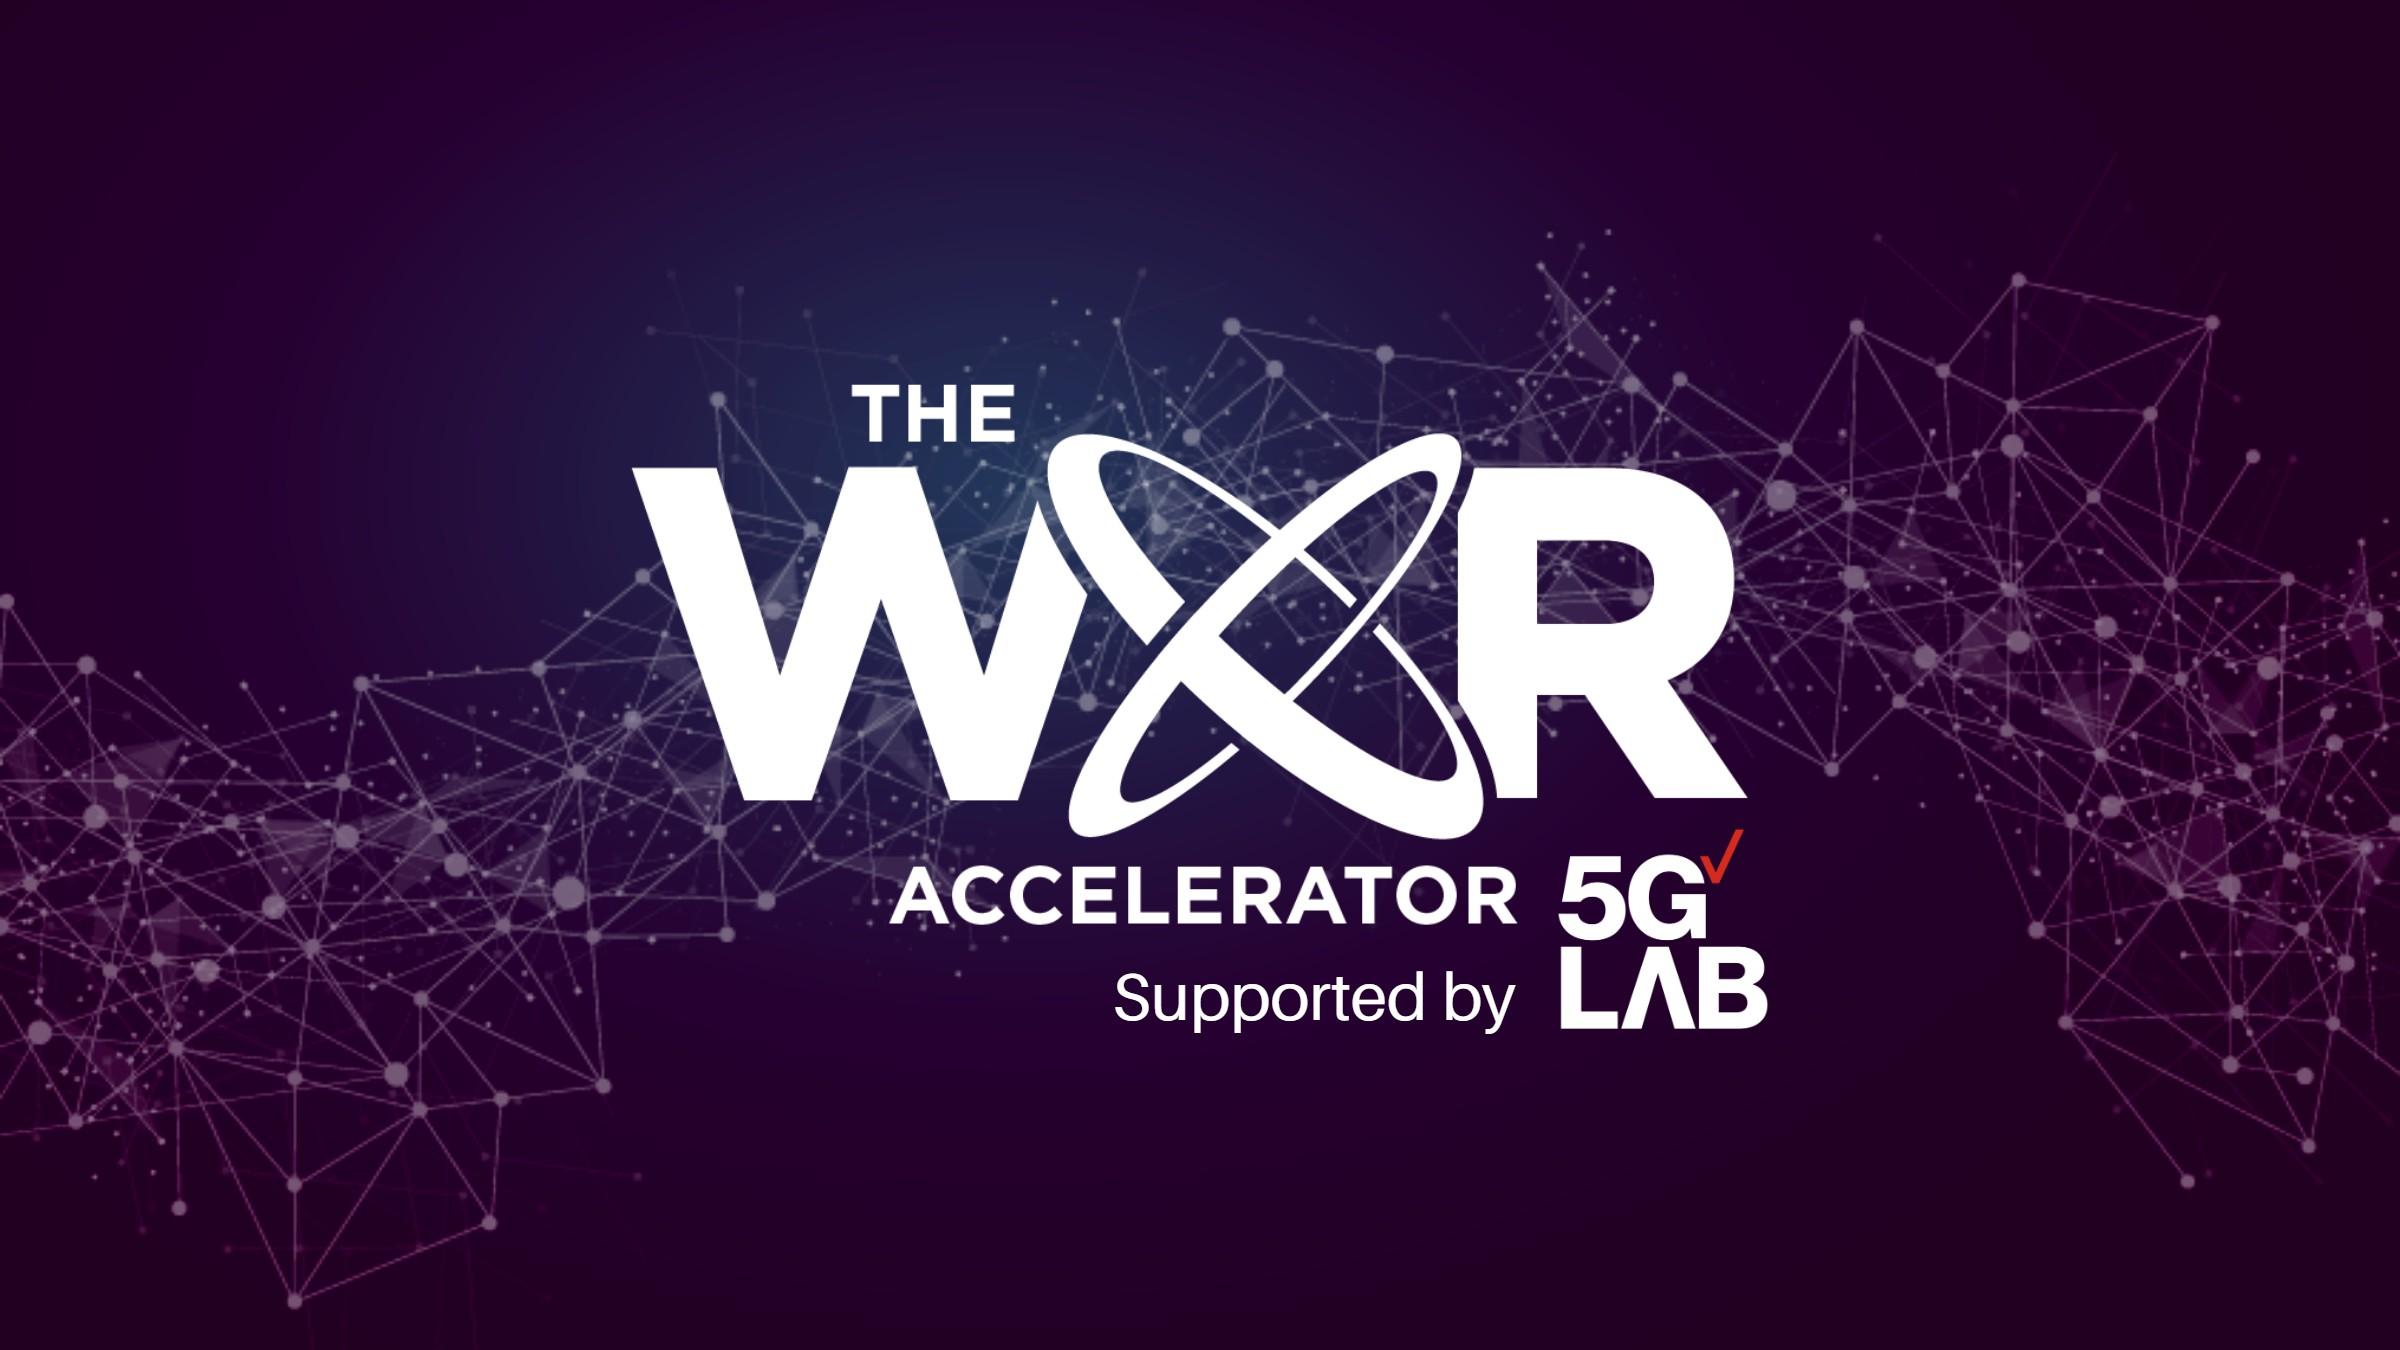 WXR-Web-Venture-Fund-Accelerator-5G-Labs-Verizon-WXR Cohort-WXR-Mentorship-Women-In-XR-Spatial-Computing-AI-2.jpg